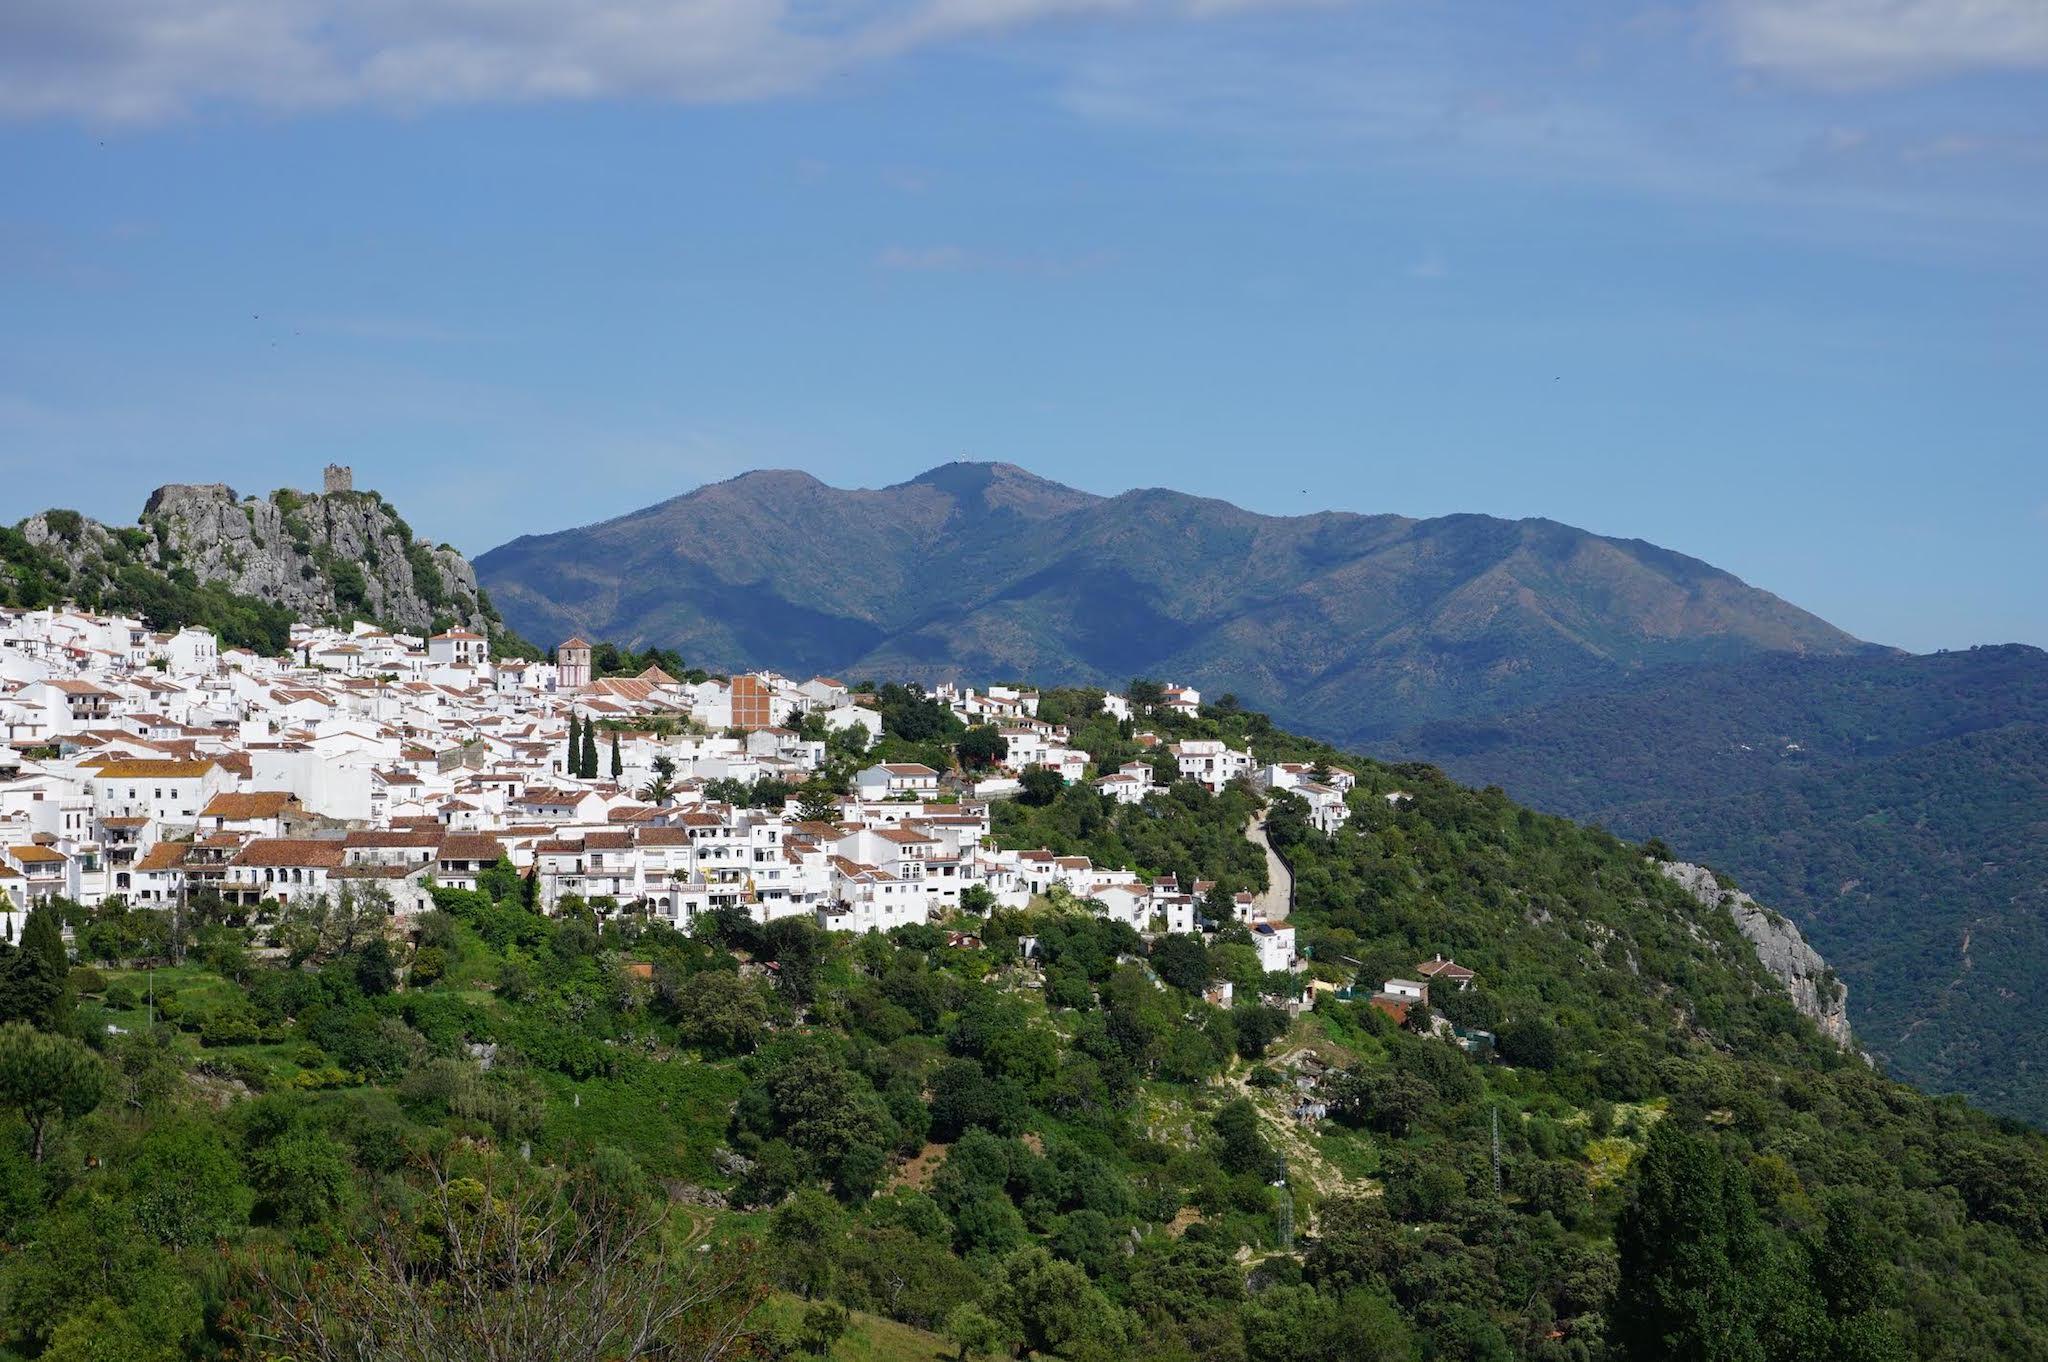 Gaucín, one of the quintessential 'pueblos blancos' of Andalucía